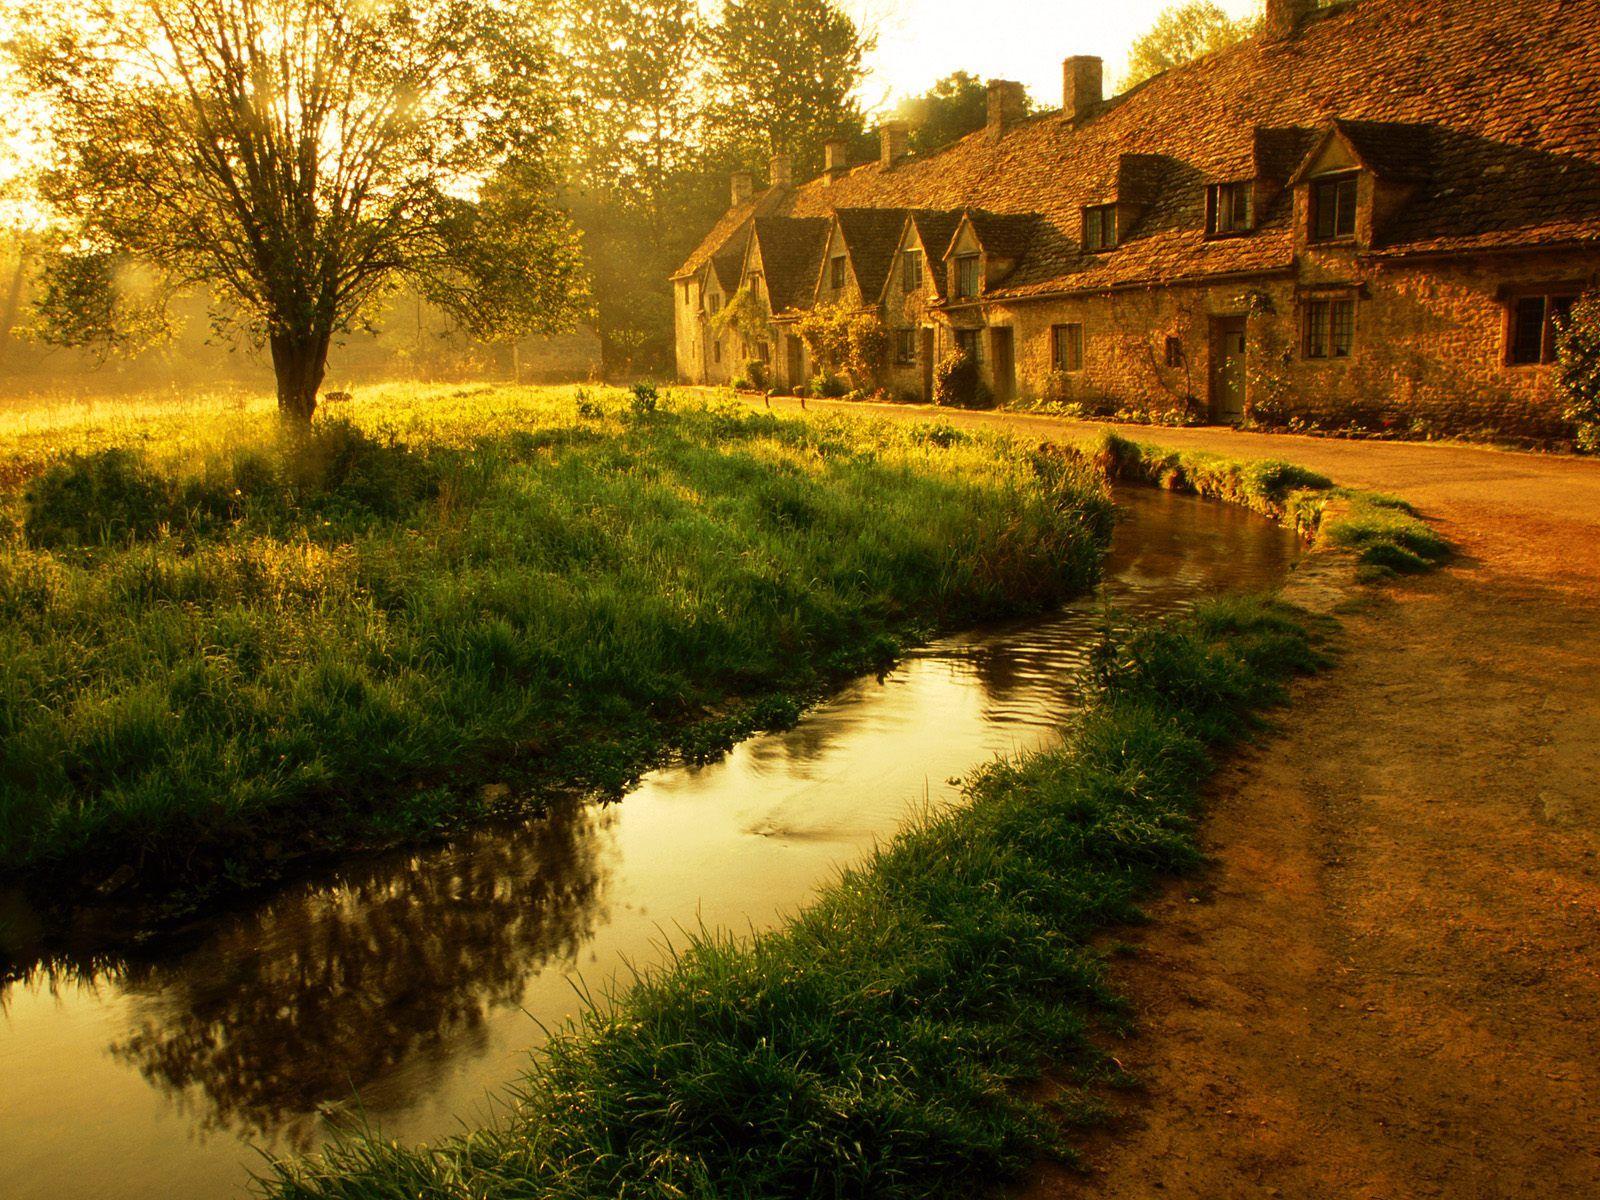 Morning2BMist2BArlington2BRow2BBibury2BGloucestershire2BEngland - Nature Wallpaper England